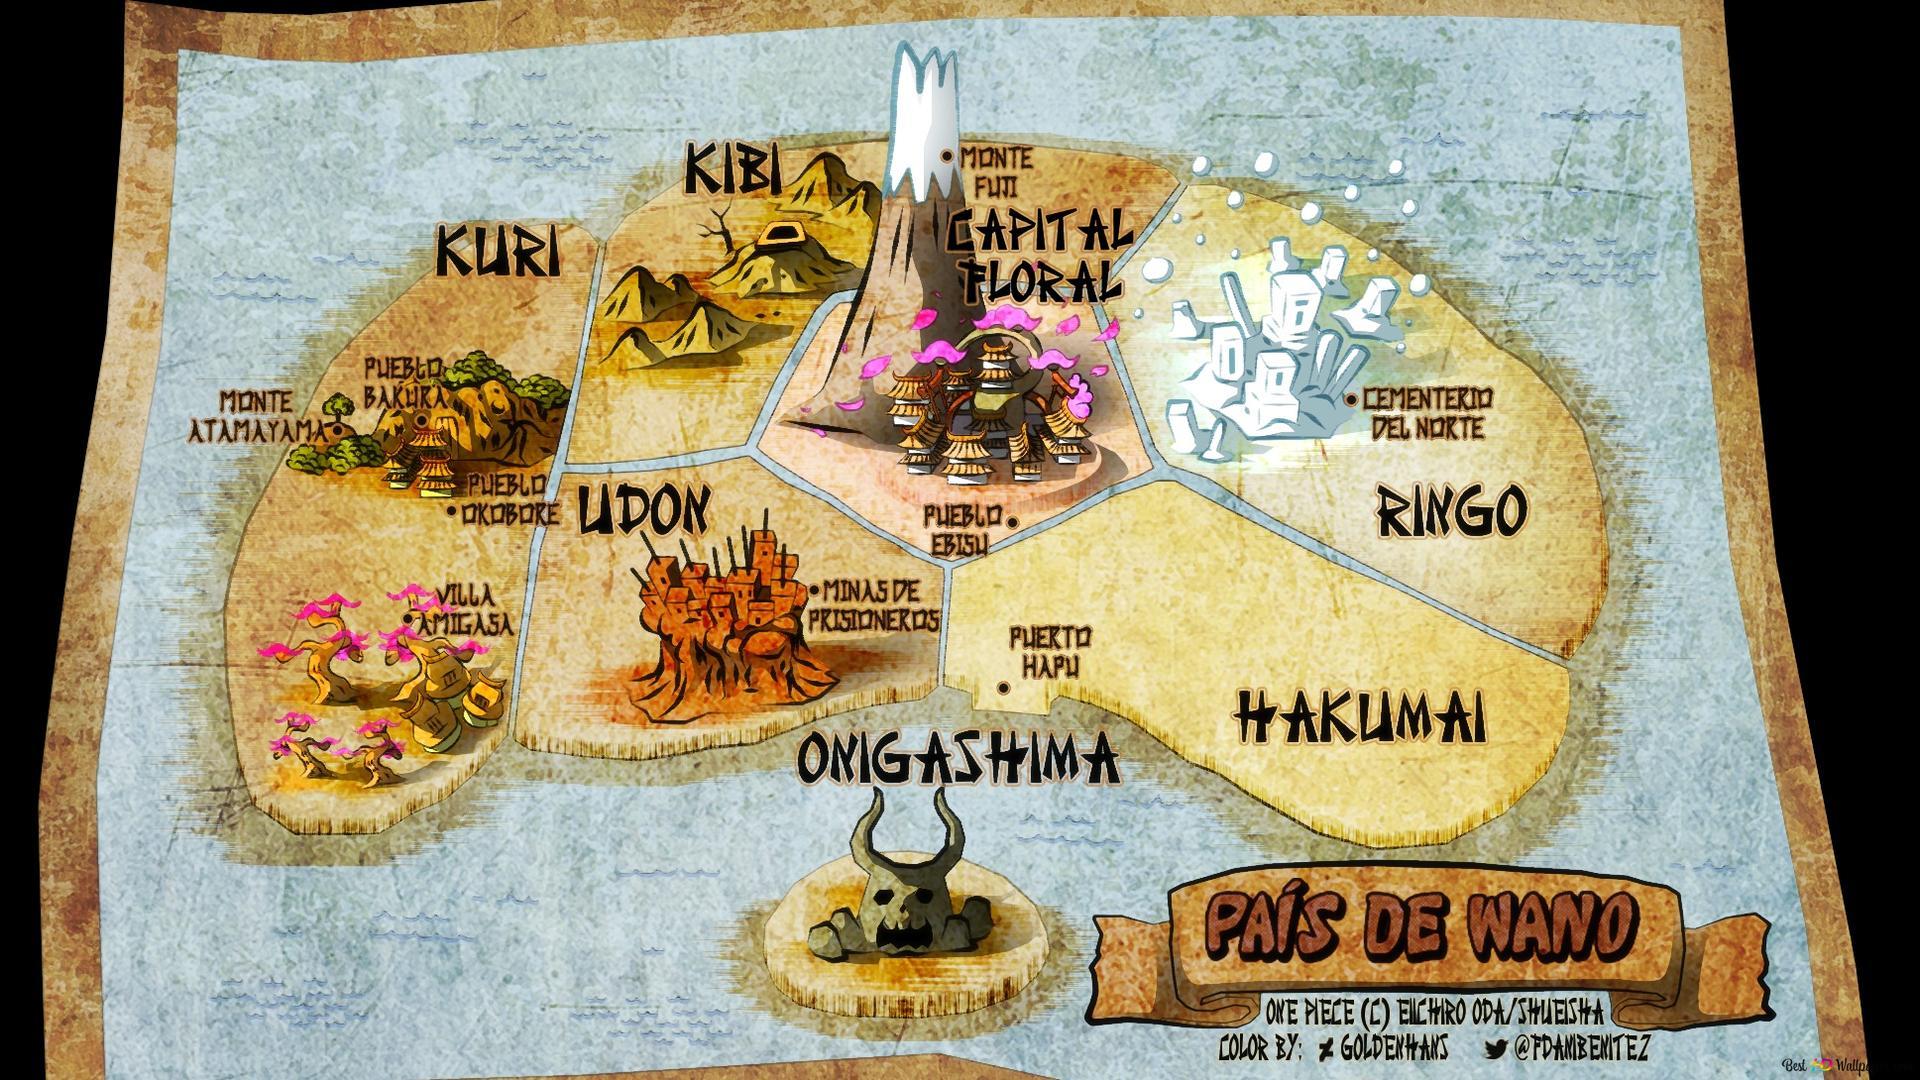 One Piece Wano Map Hd Wallpaper Download